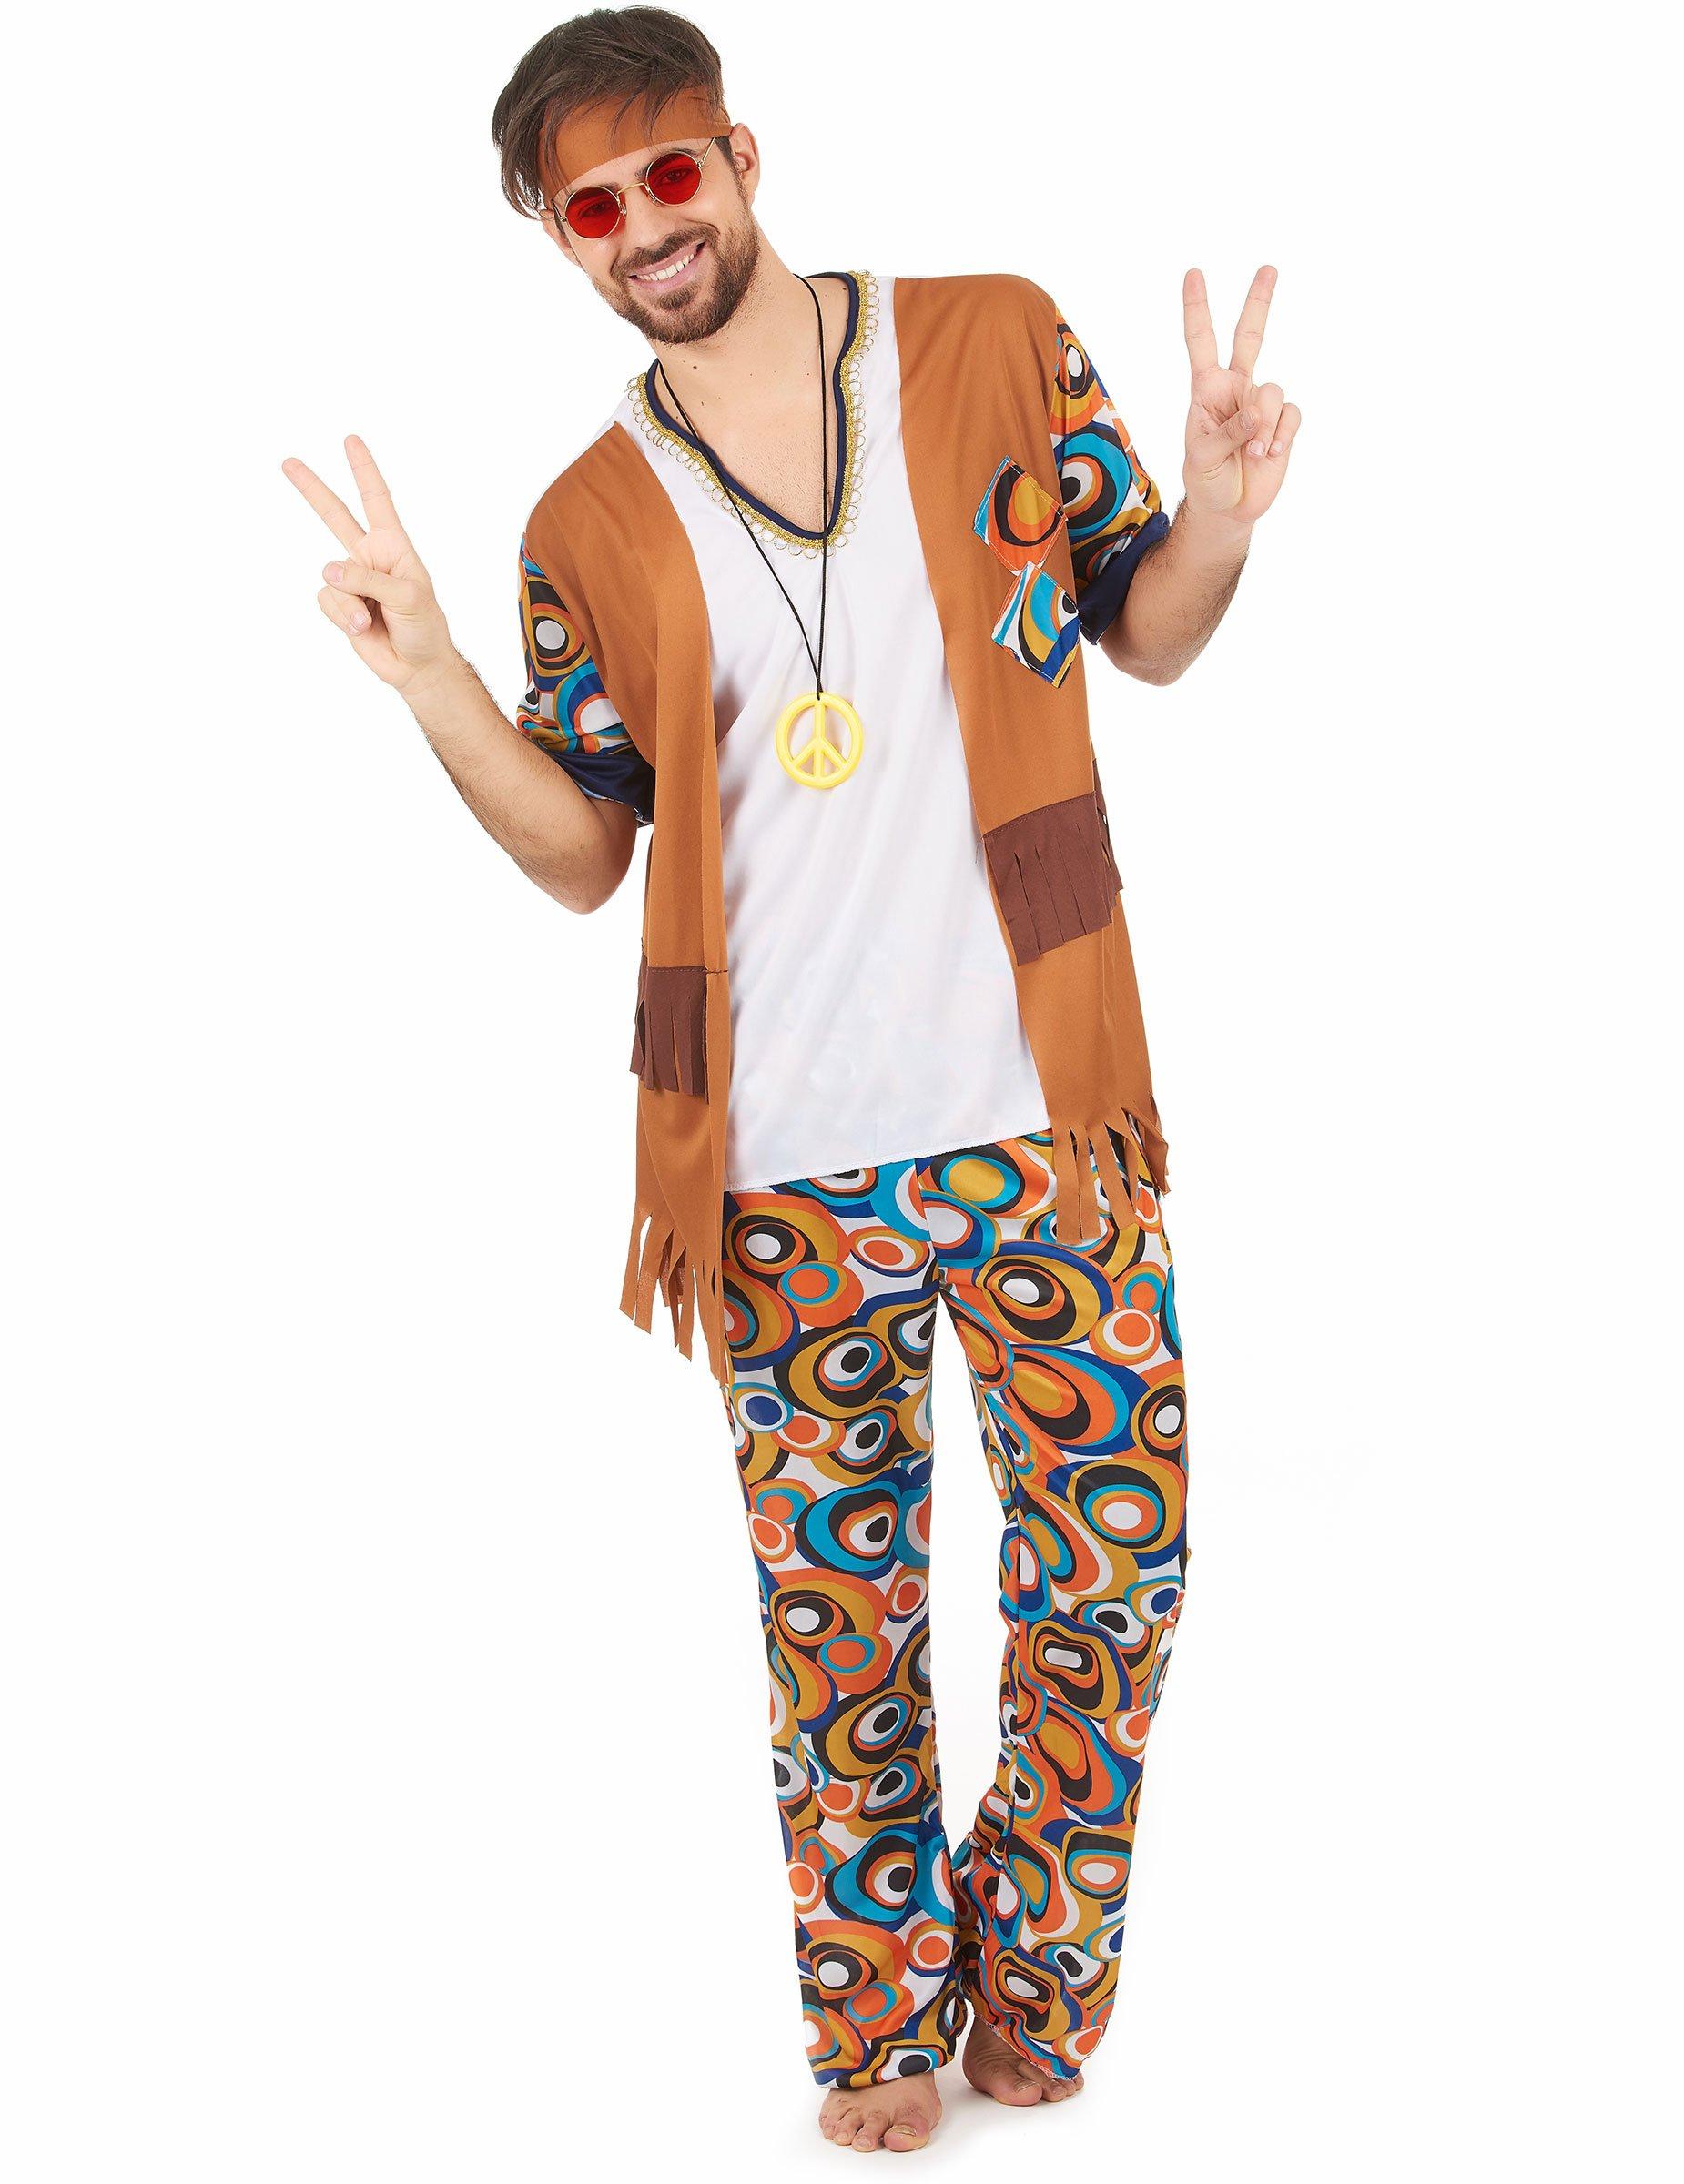 Matrimonio Hippie Uomo : Costume hippie uomo